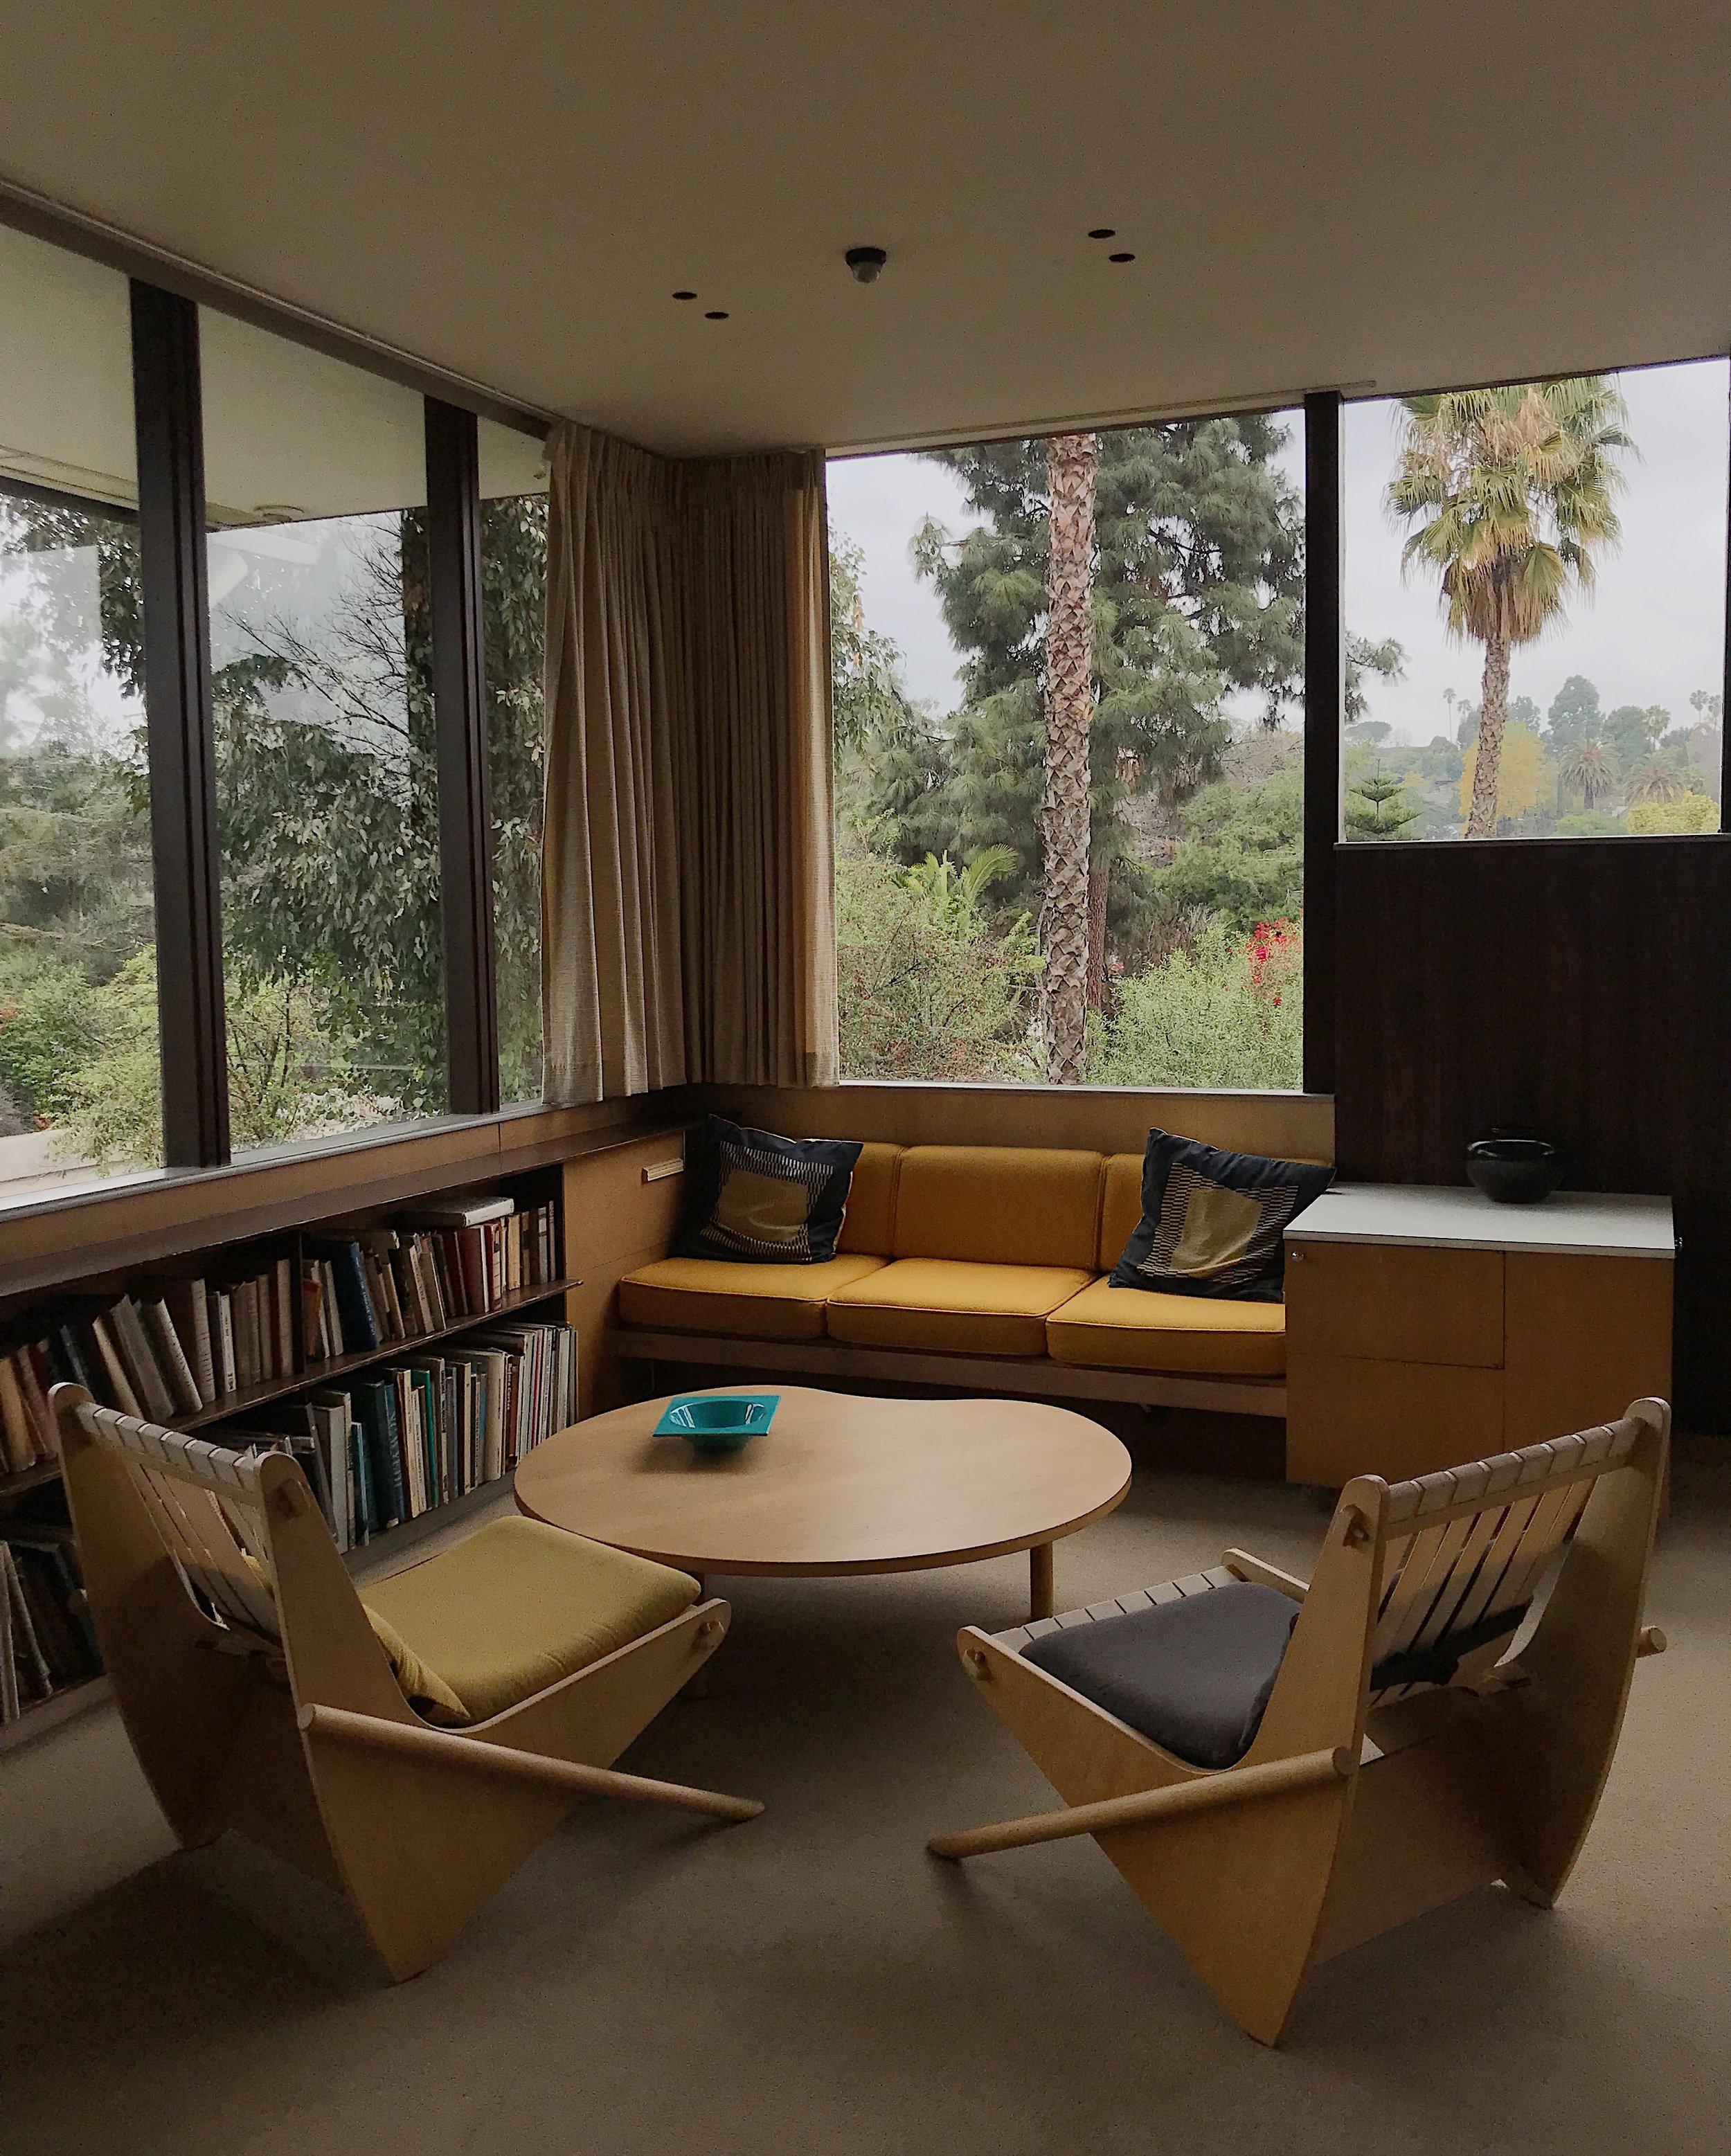 neutra_vdl_house_california_los_angeles